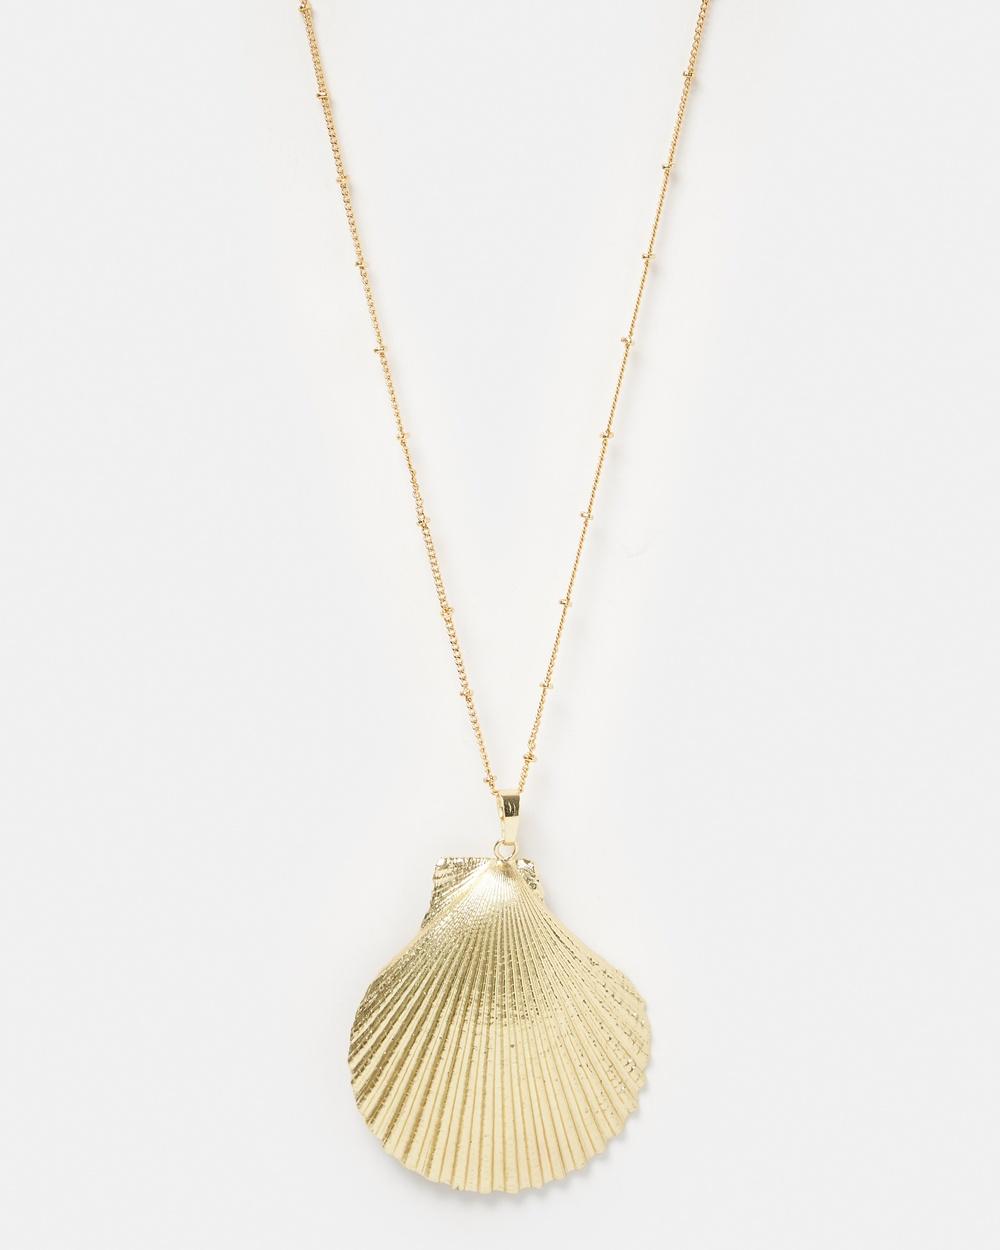 Miz Casa and Co Thalasso Necklace Jewellery Gold